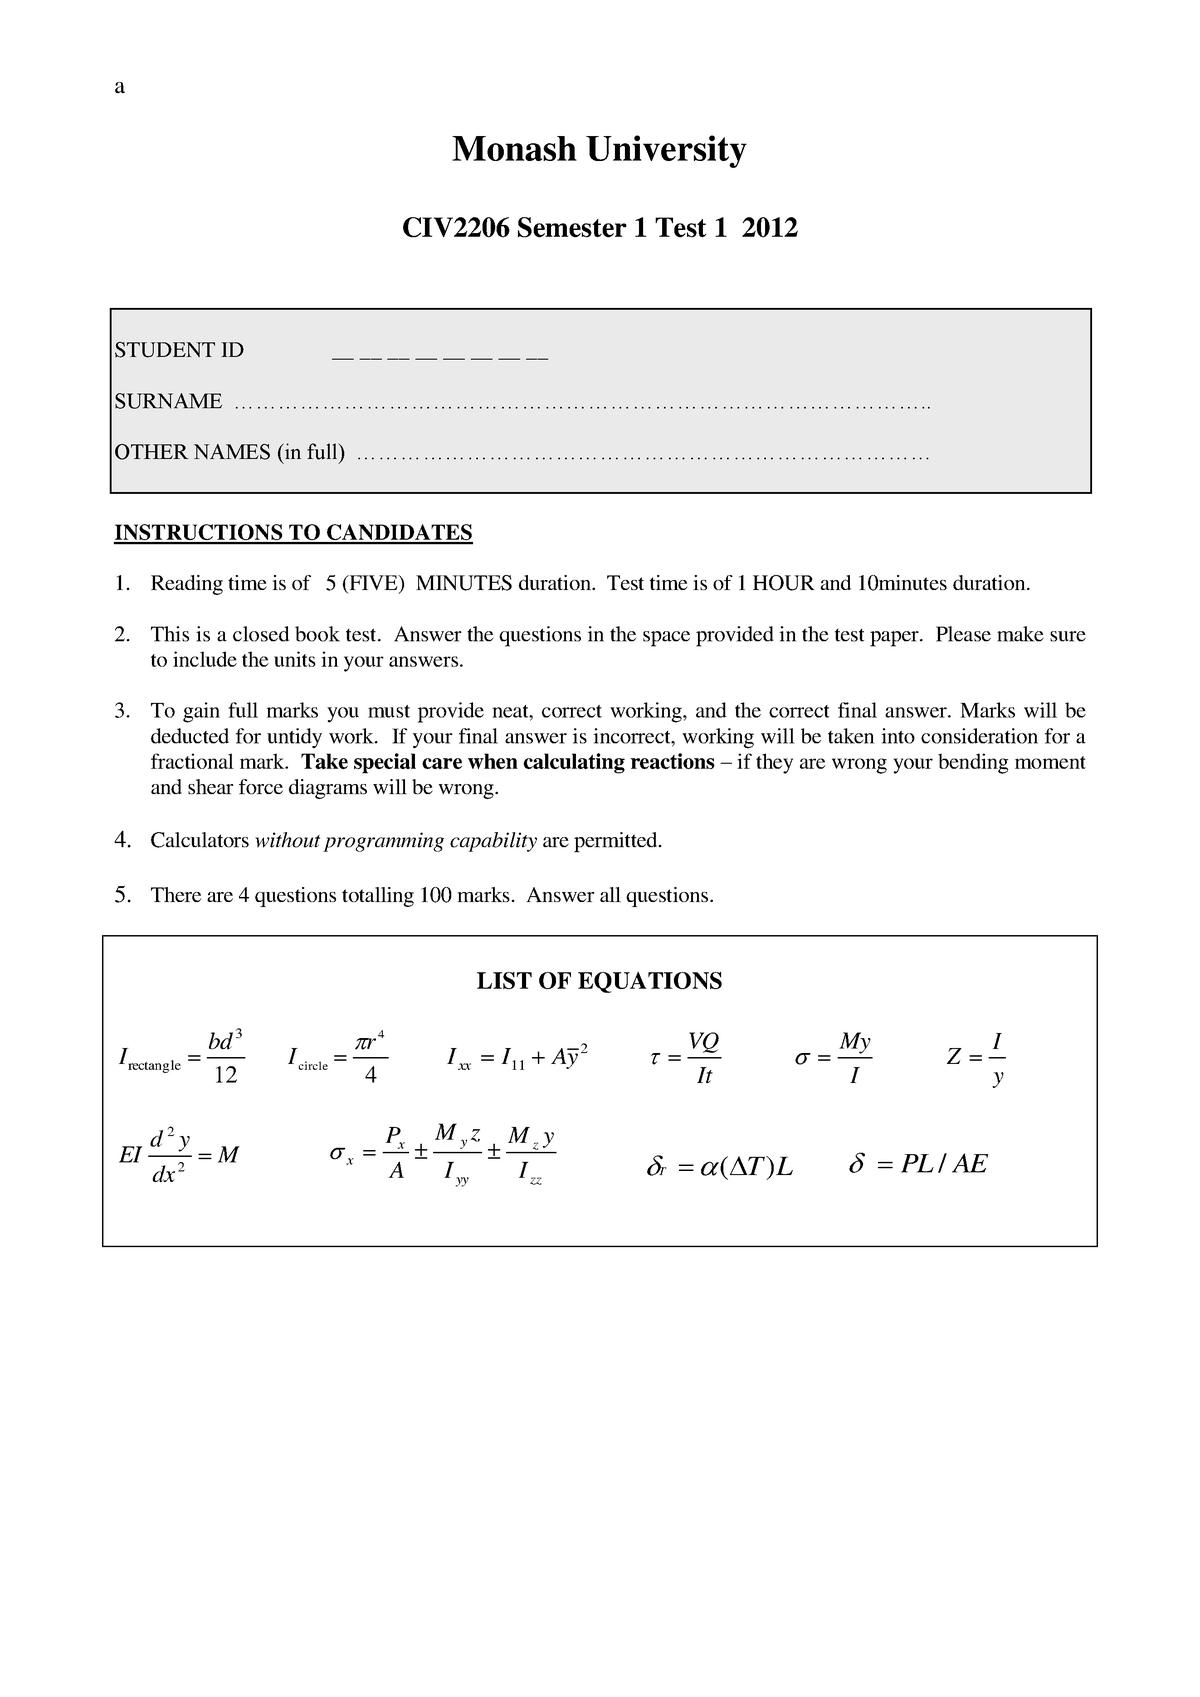 Exam 2012 - CIV2206: Mechanics Of Solids - StuDocu